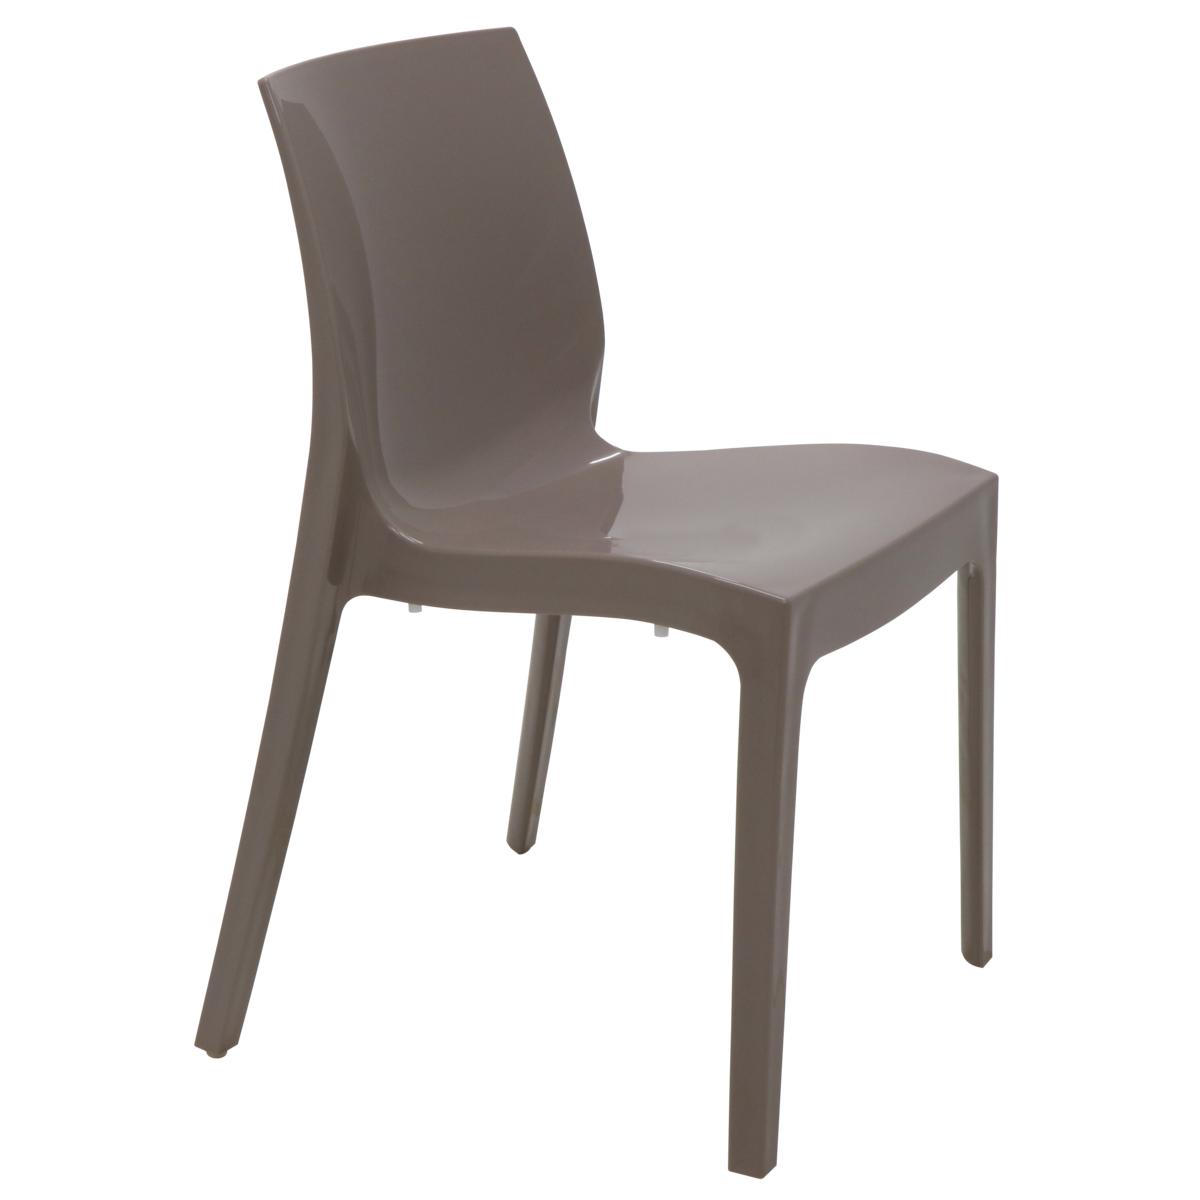 Cadeira Tramontina Alice Camurça 92037/210 Conjunto  4 peças  - Casa Mattos